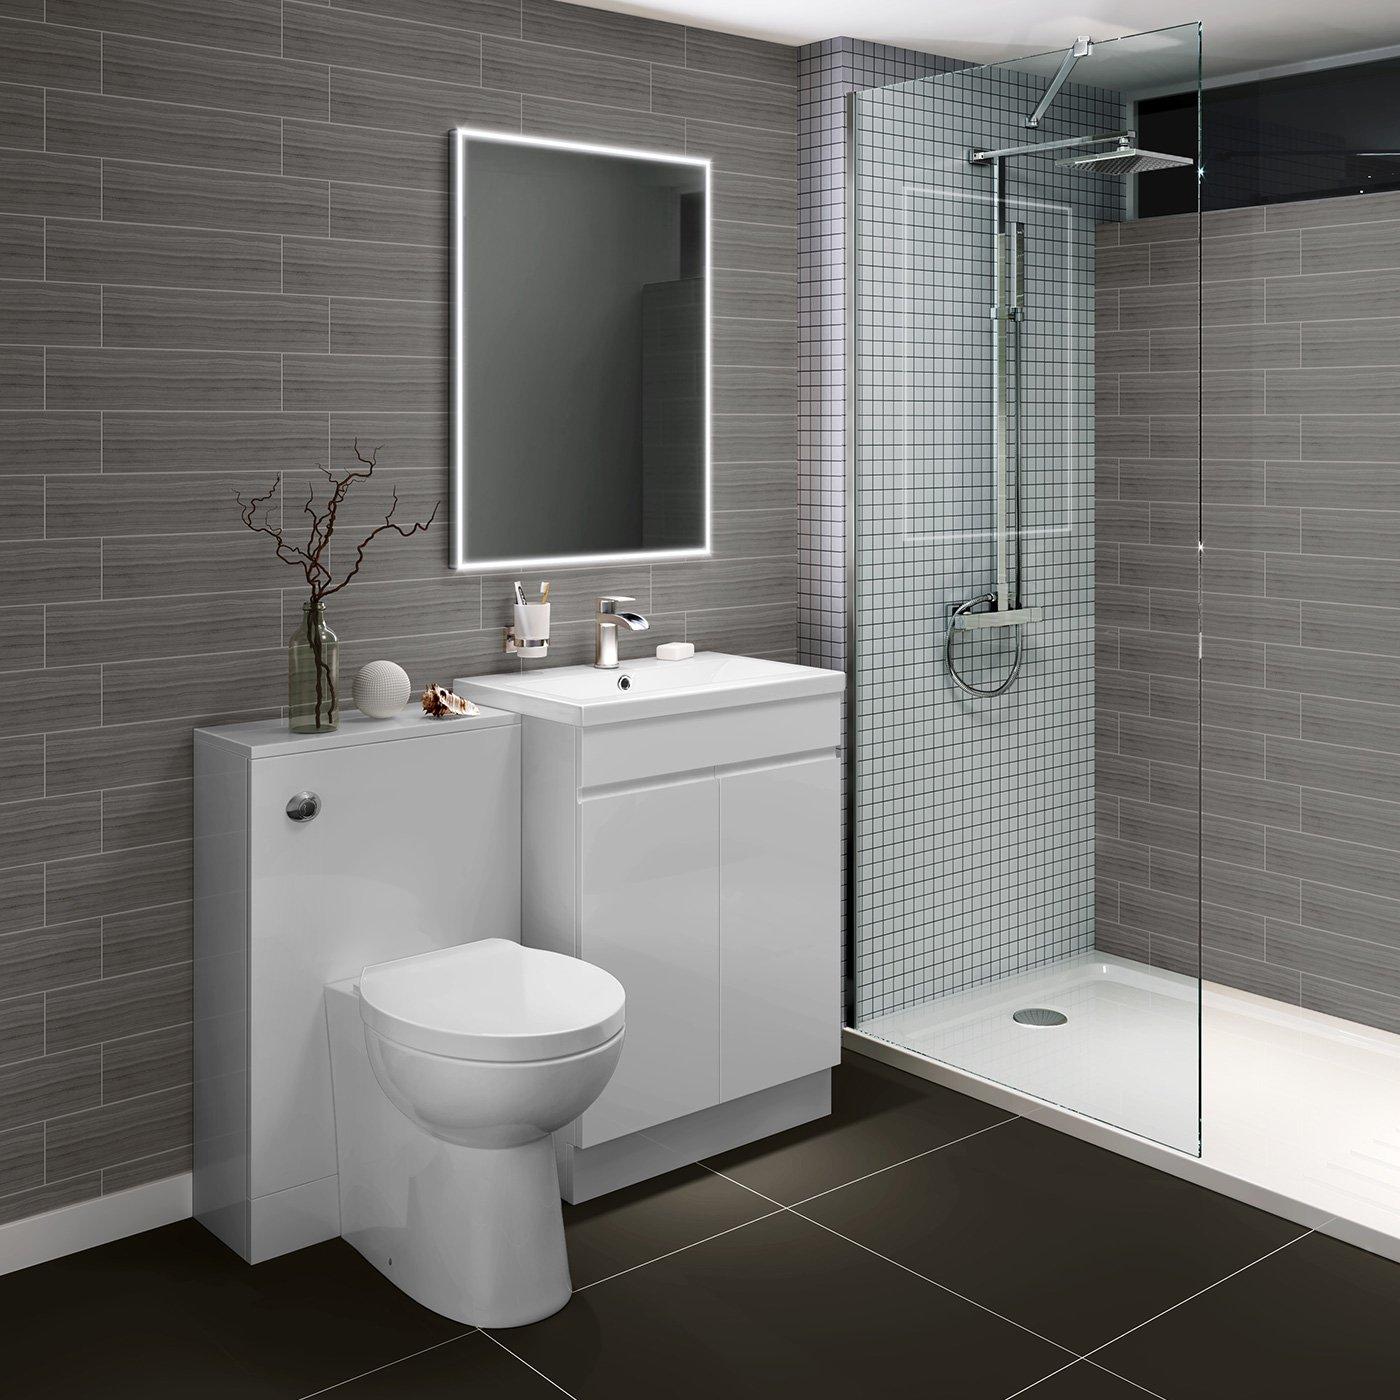 600 x 800 mm Designer Illuminated LED Bathroom Mirror Light Sensor Demister ML4002